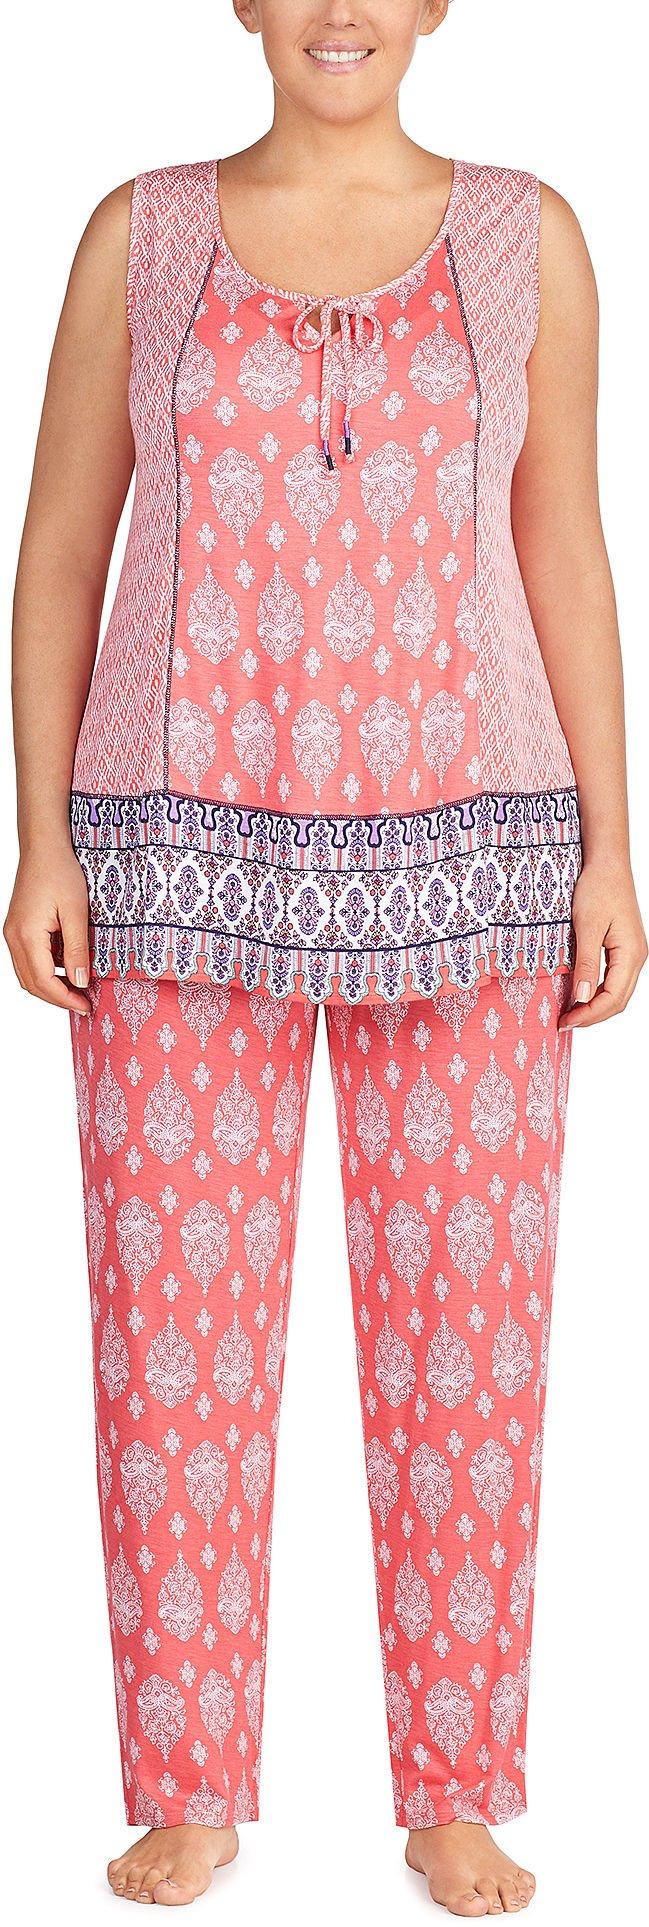 Ellen Tracy Women's Plus Size Sleeveless Pajama Set, Batik geo, 1X